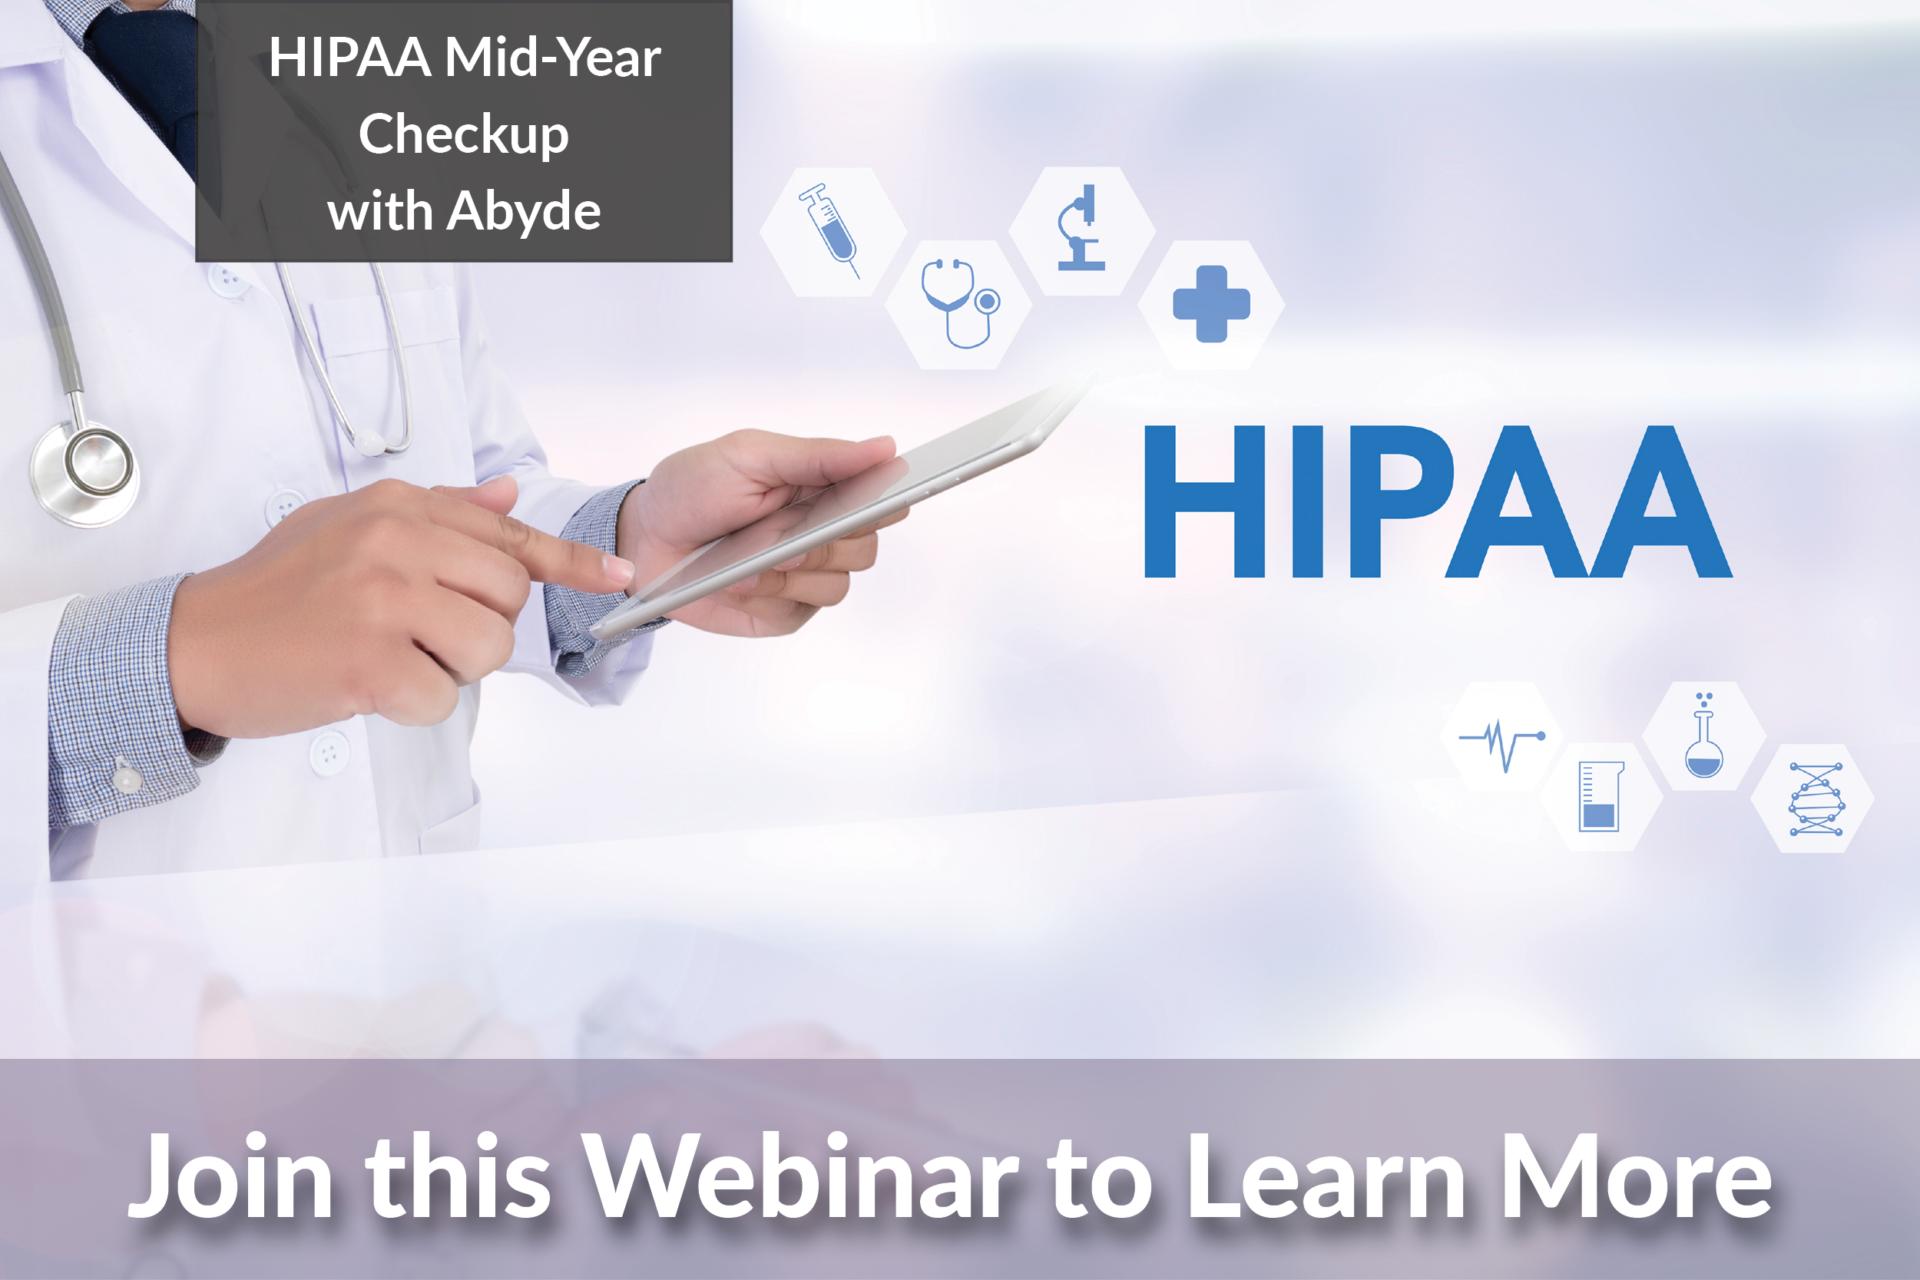 Webinar Image - HIPAA Mid-Year Checkup with Abyde